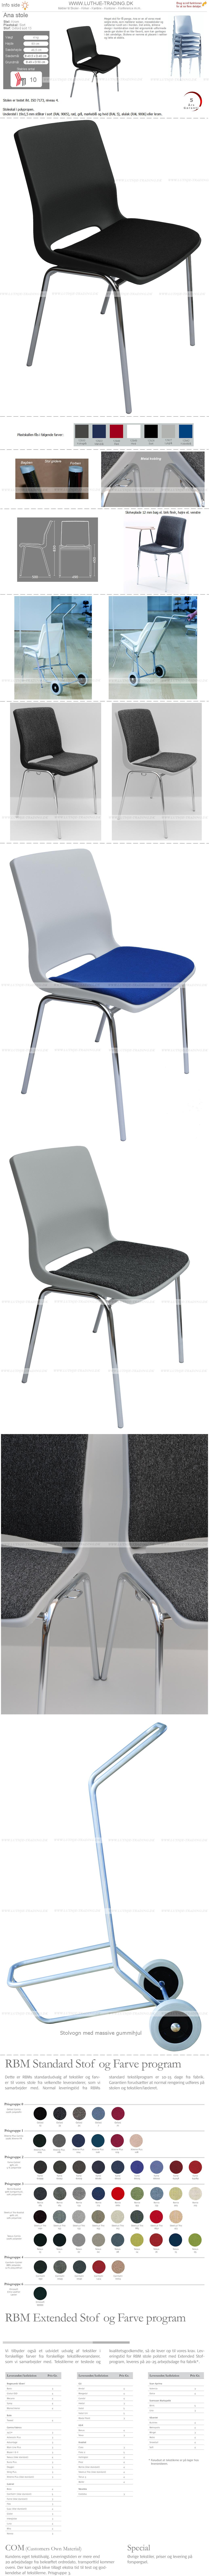 Ana stol med krom stel, sort plastskal og Oxford stof sort nr. 13. Der er 5 års garanti på Ana stole.